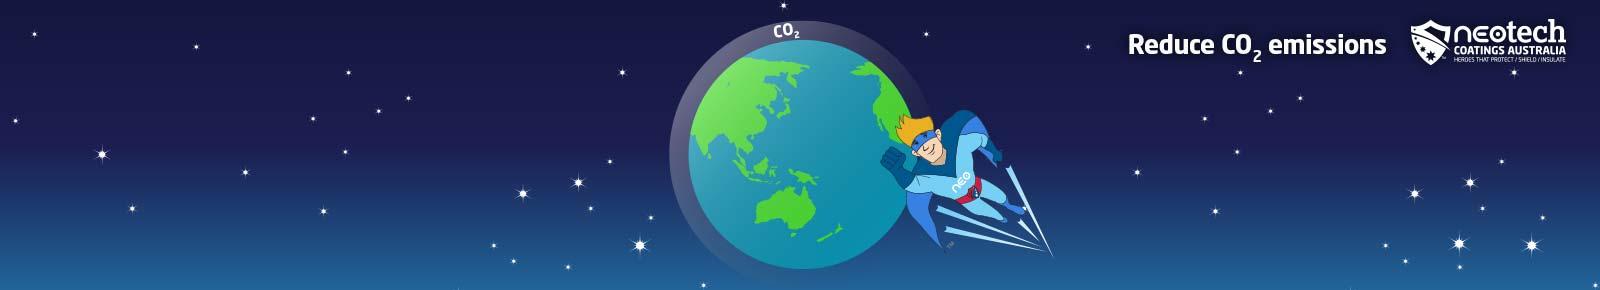 NEOtech Coatings Australia Reduce CO2 emissions